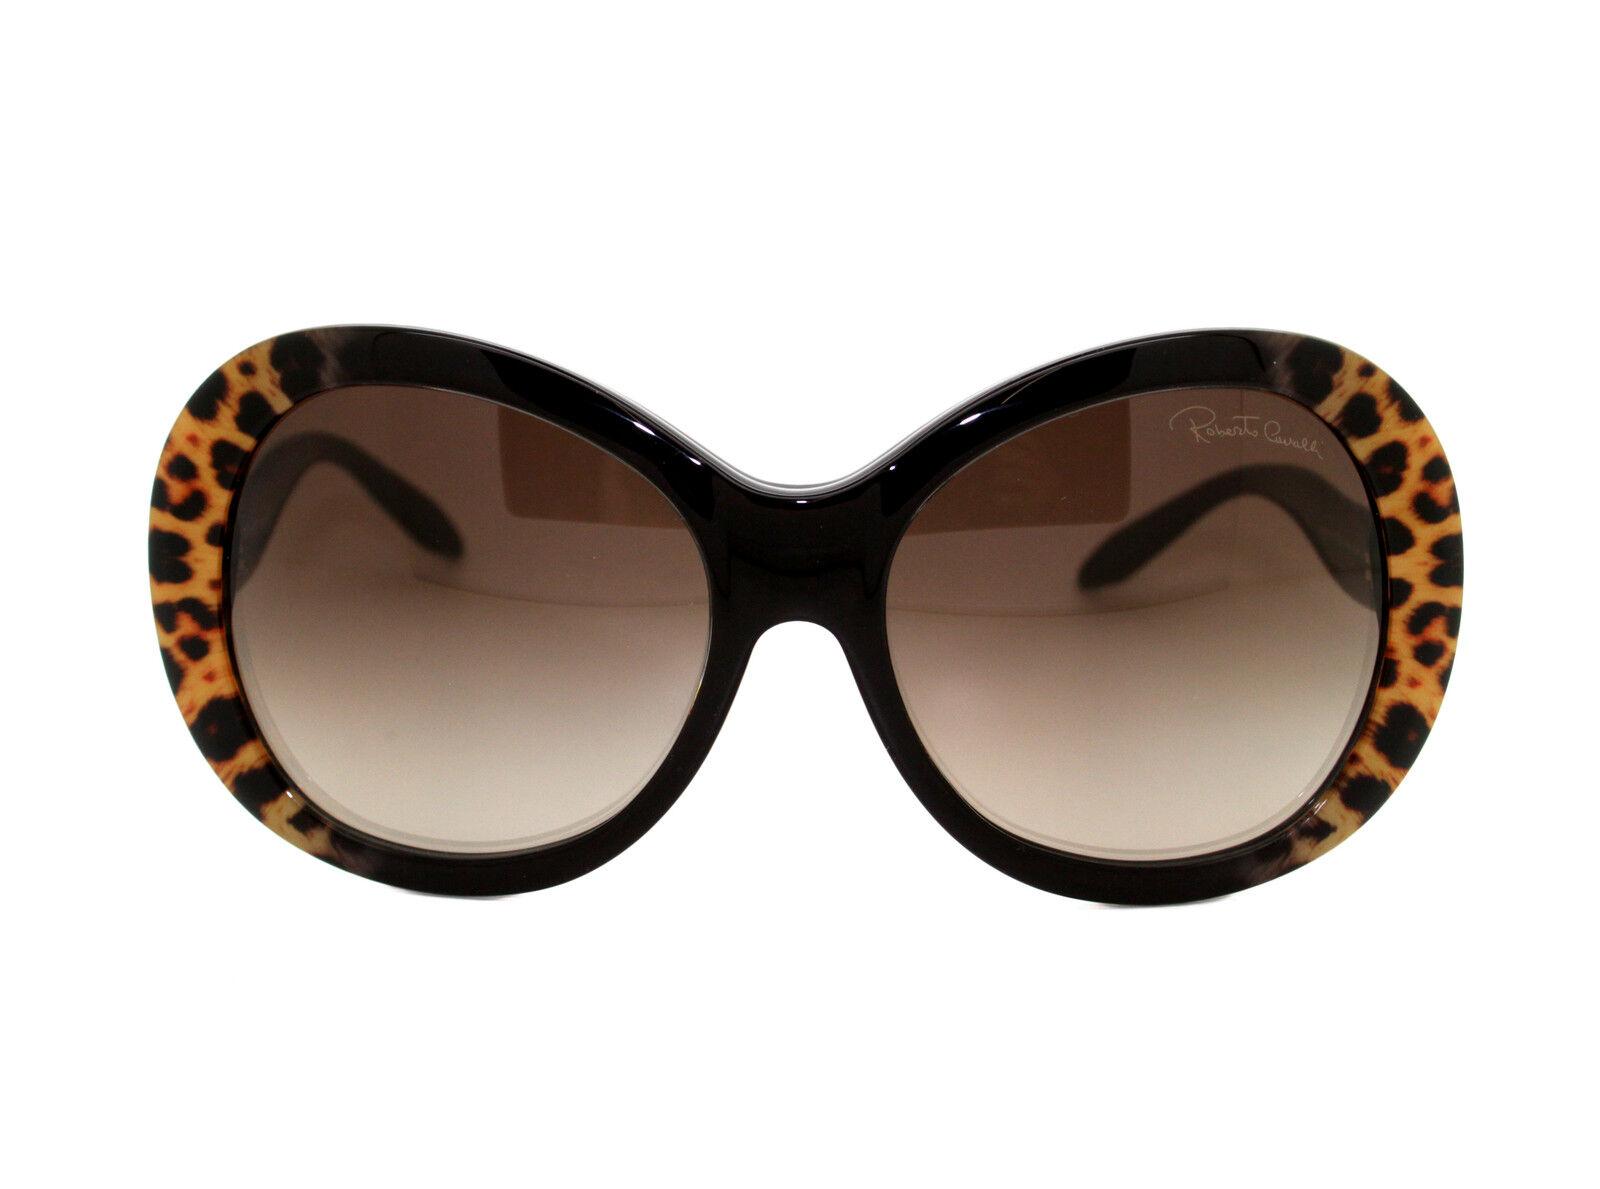 Hot Roberto Cavalli Womens Sunglasses Celebrity Oversize Frames Italy RC734S 05G